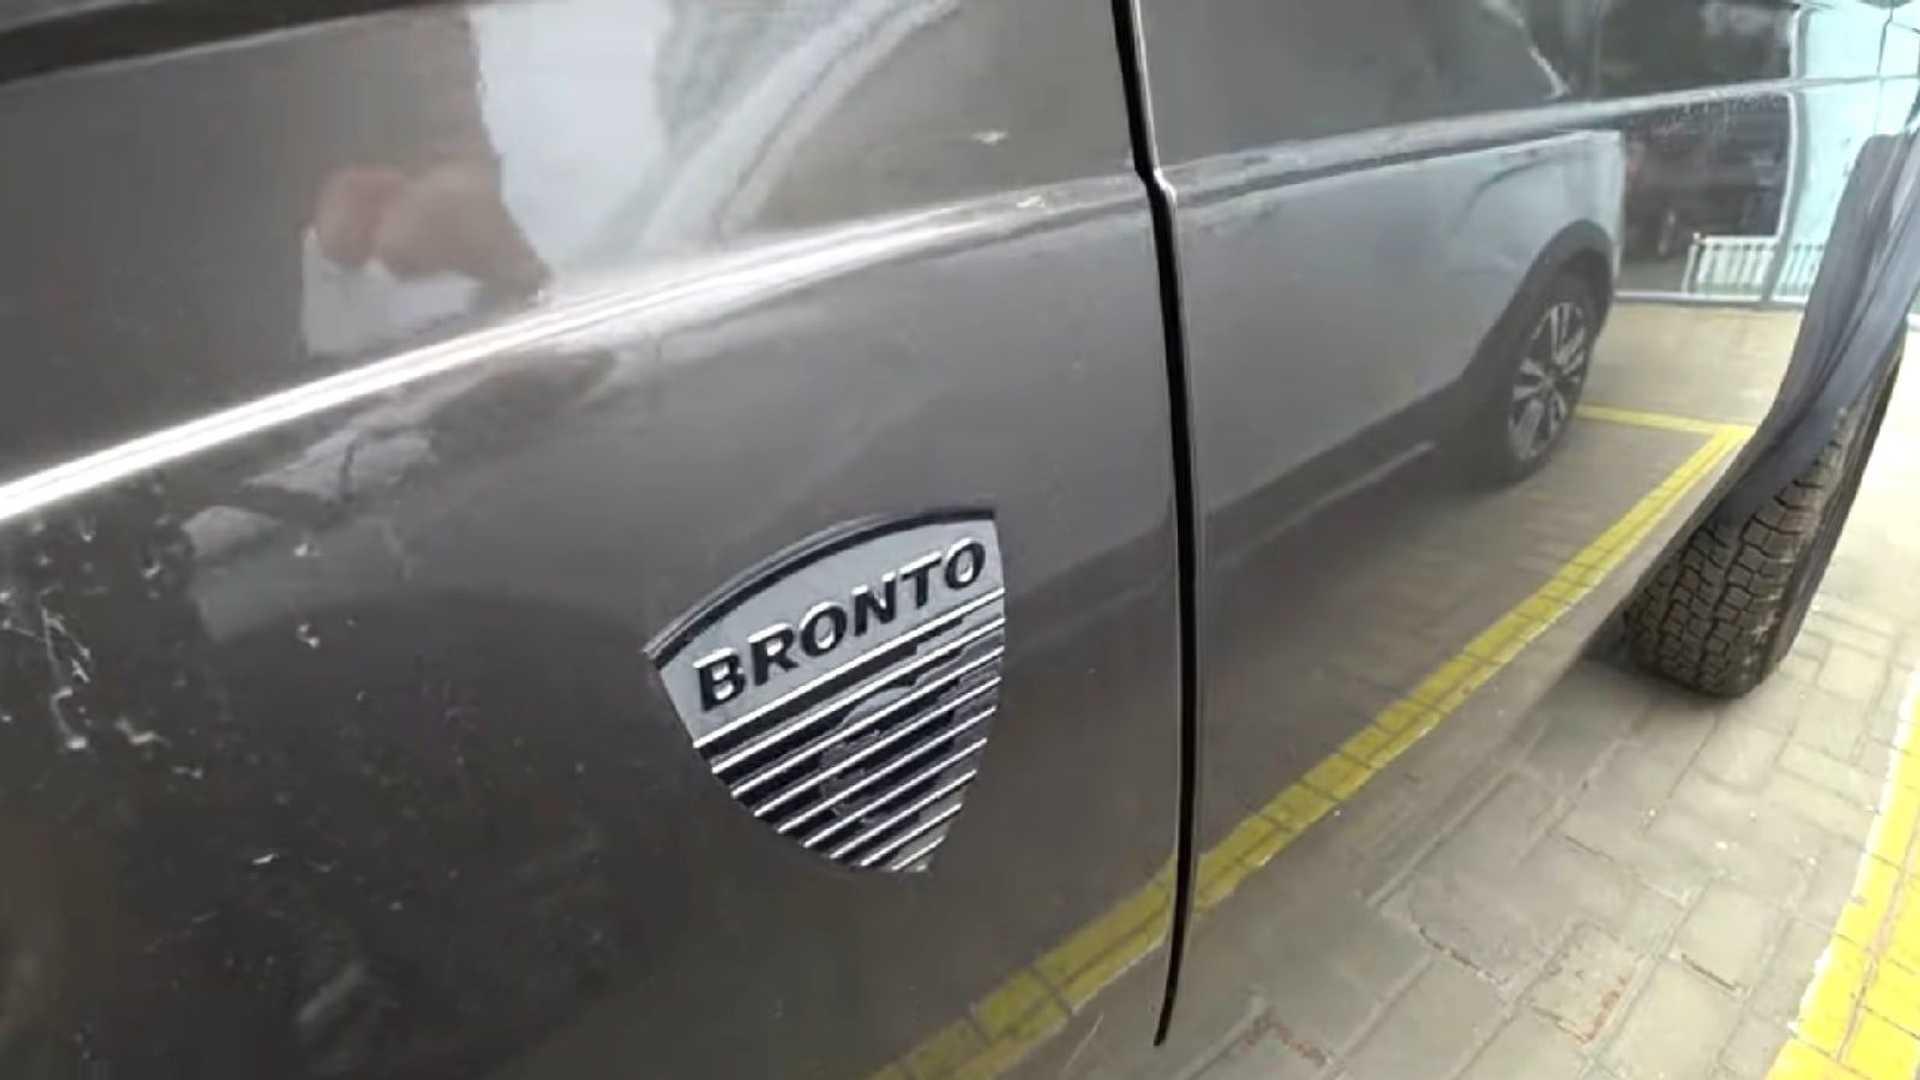 The Niva Bronto